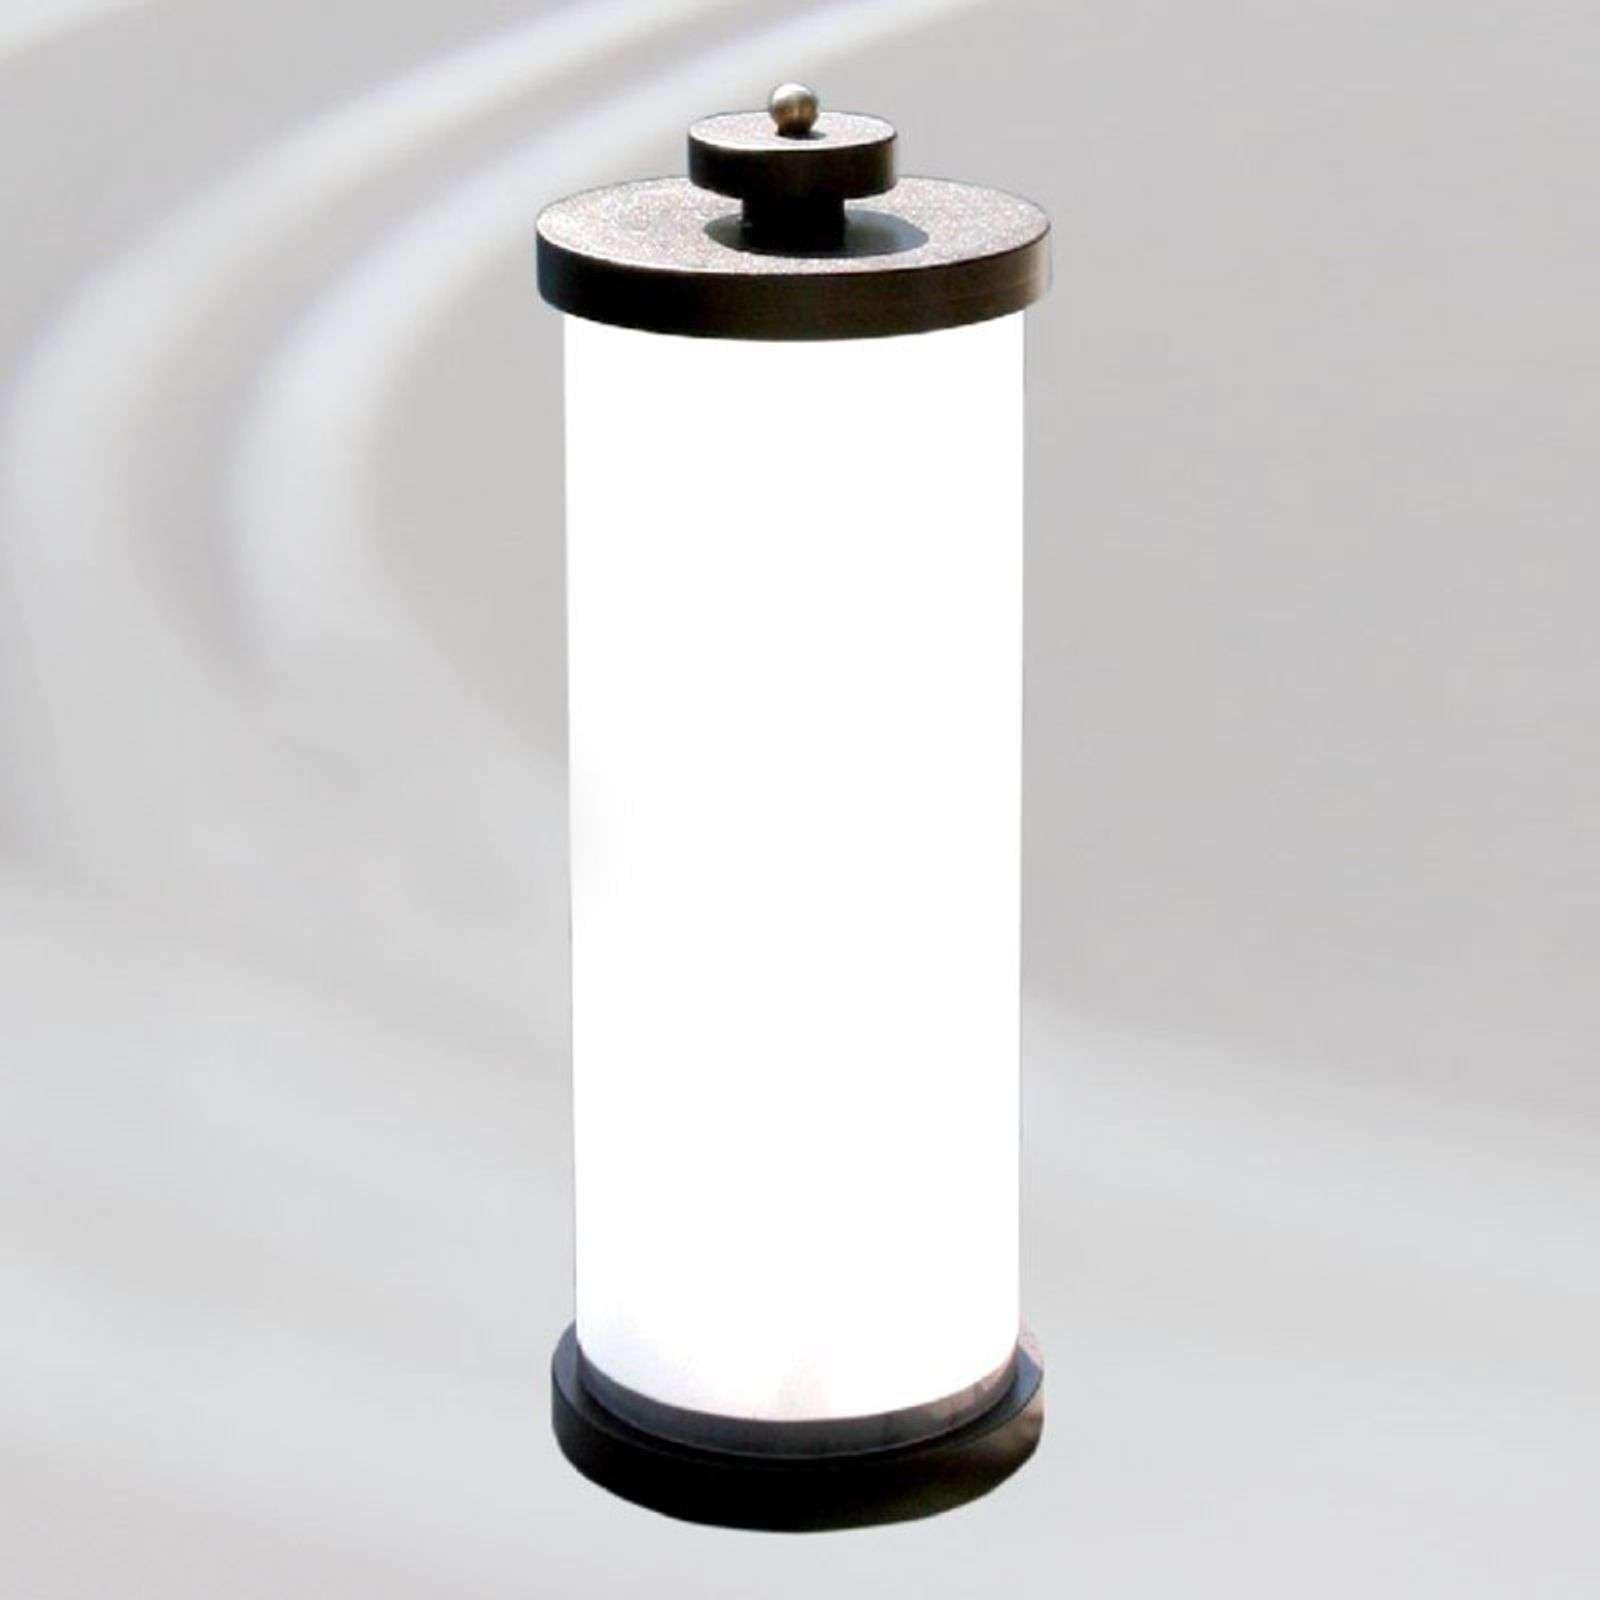 Round pillar light Bali  57 cm high